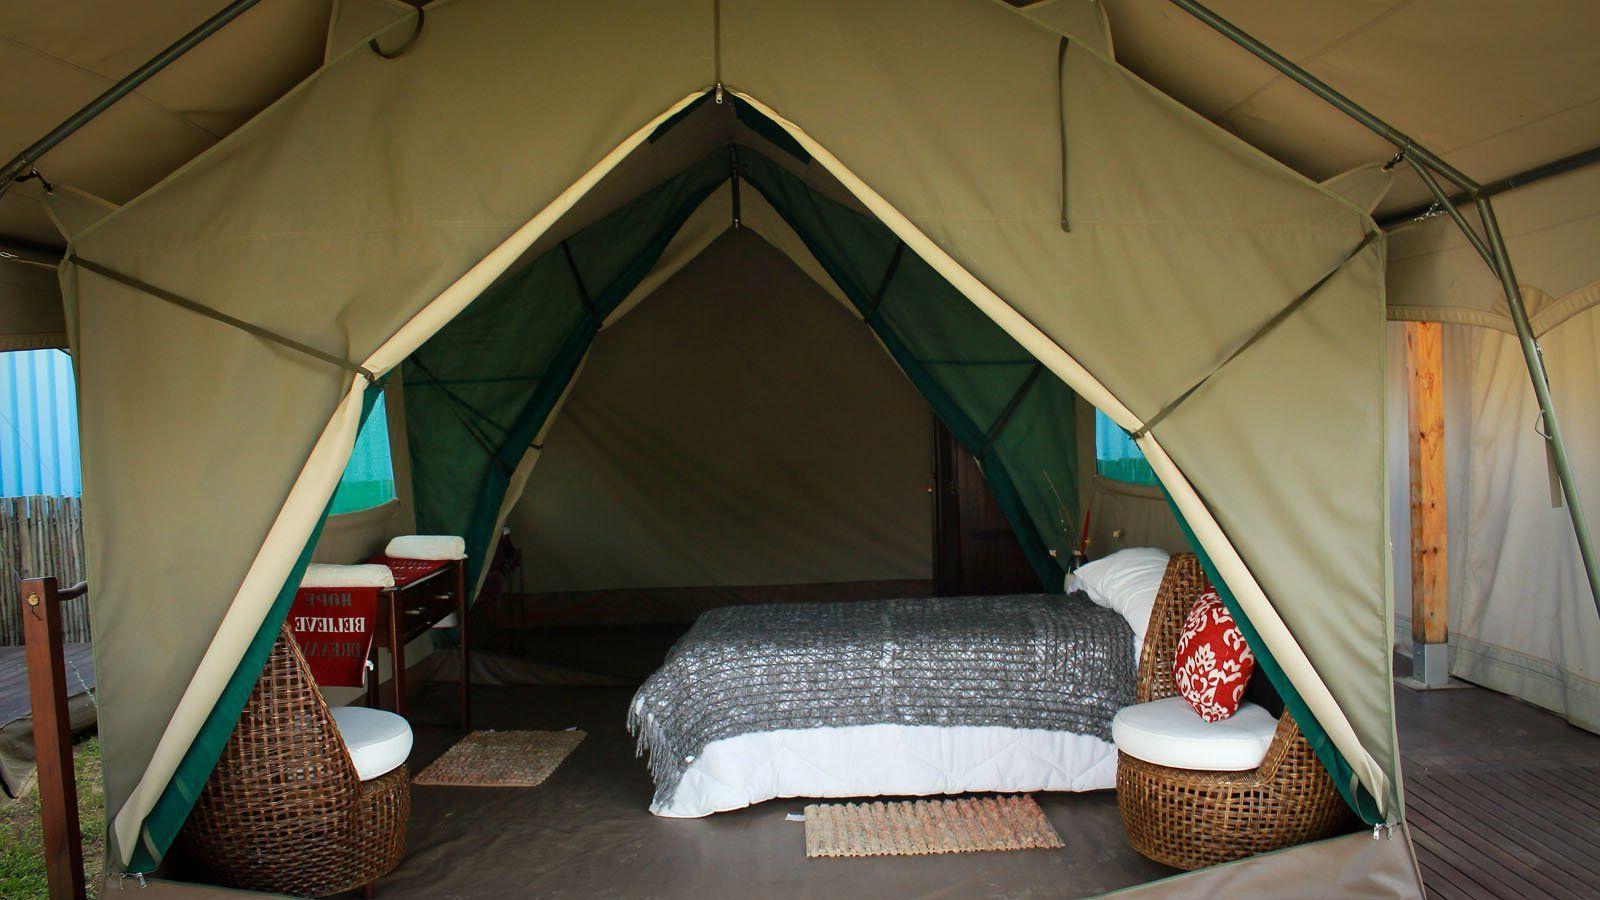 Bushtec Adventure Echo 2200 Luxury Camping Tents Luxury